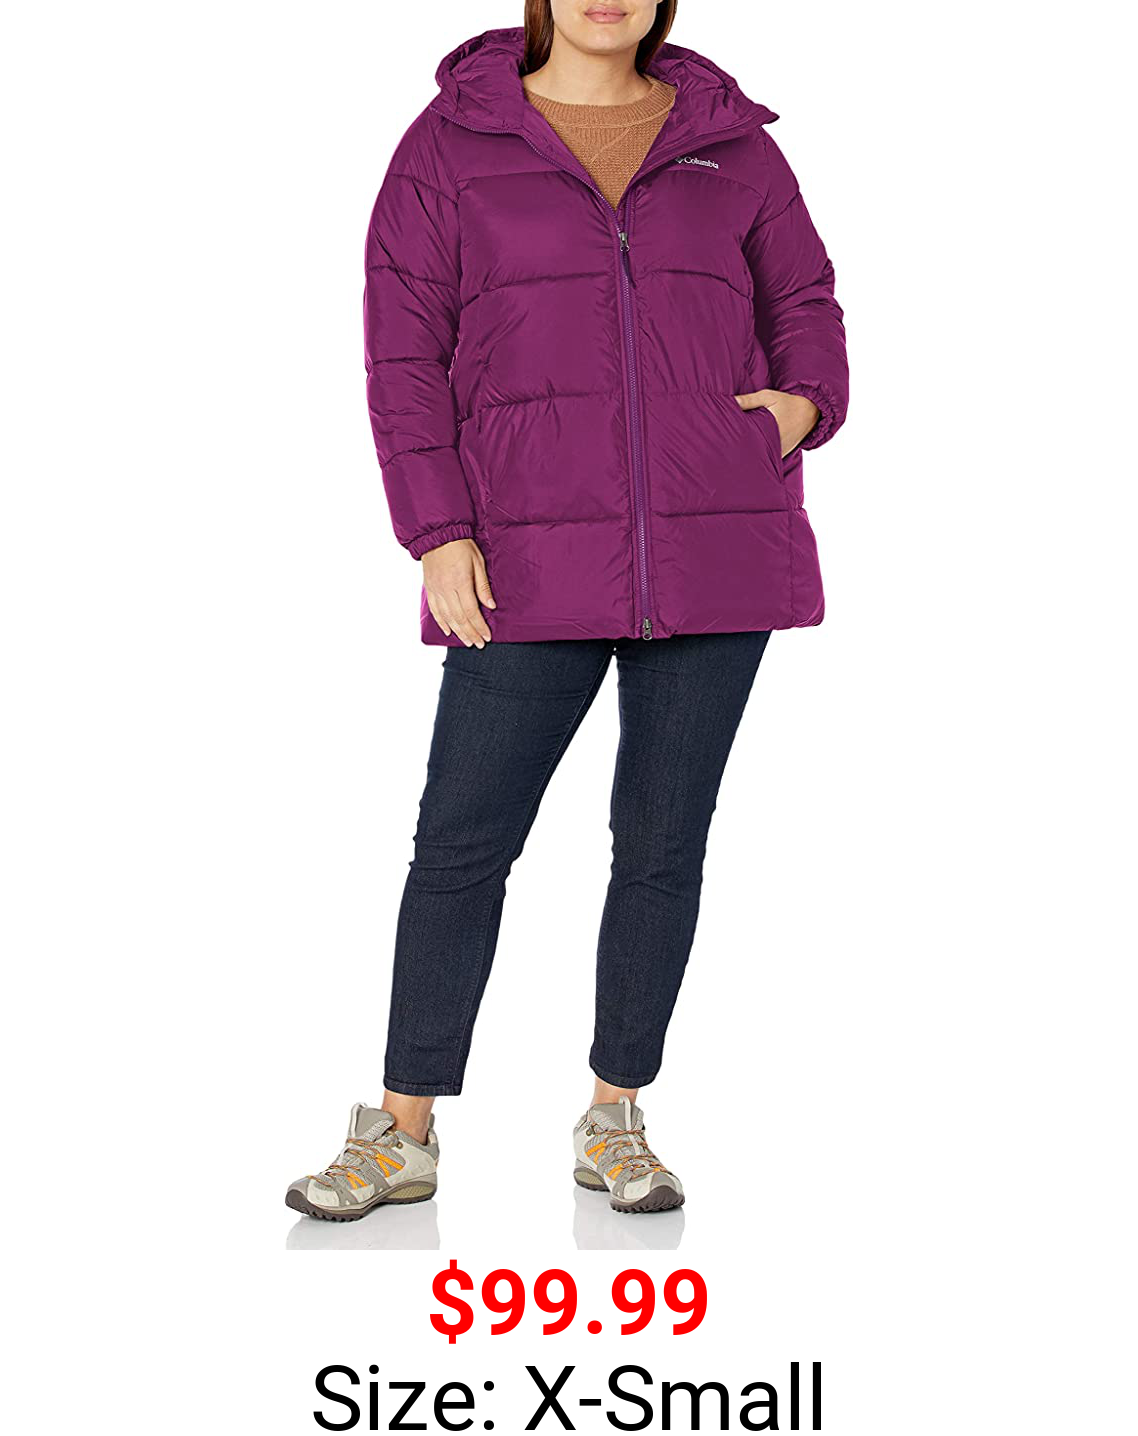 Columbia Women's Puffect Mid Hooded Winter Jacket, Water repellent